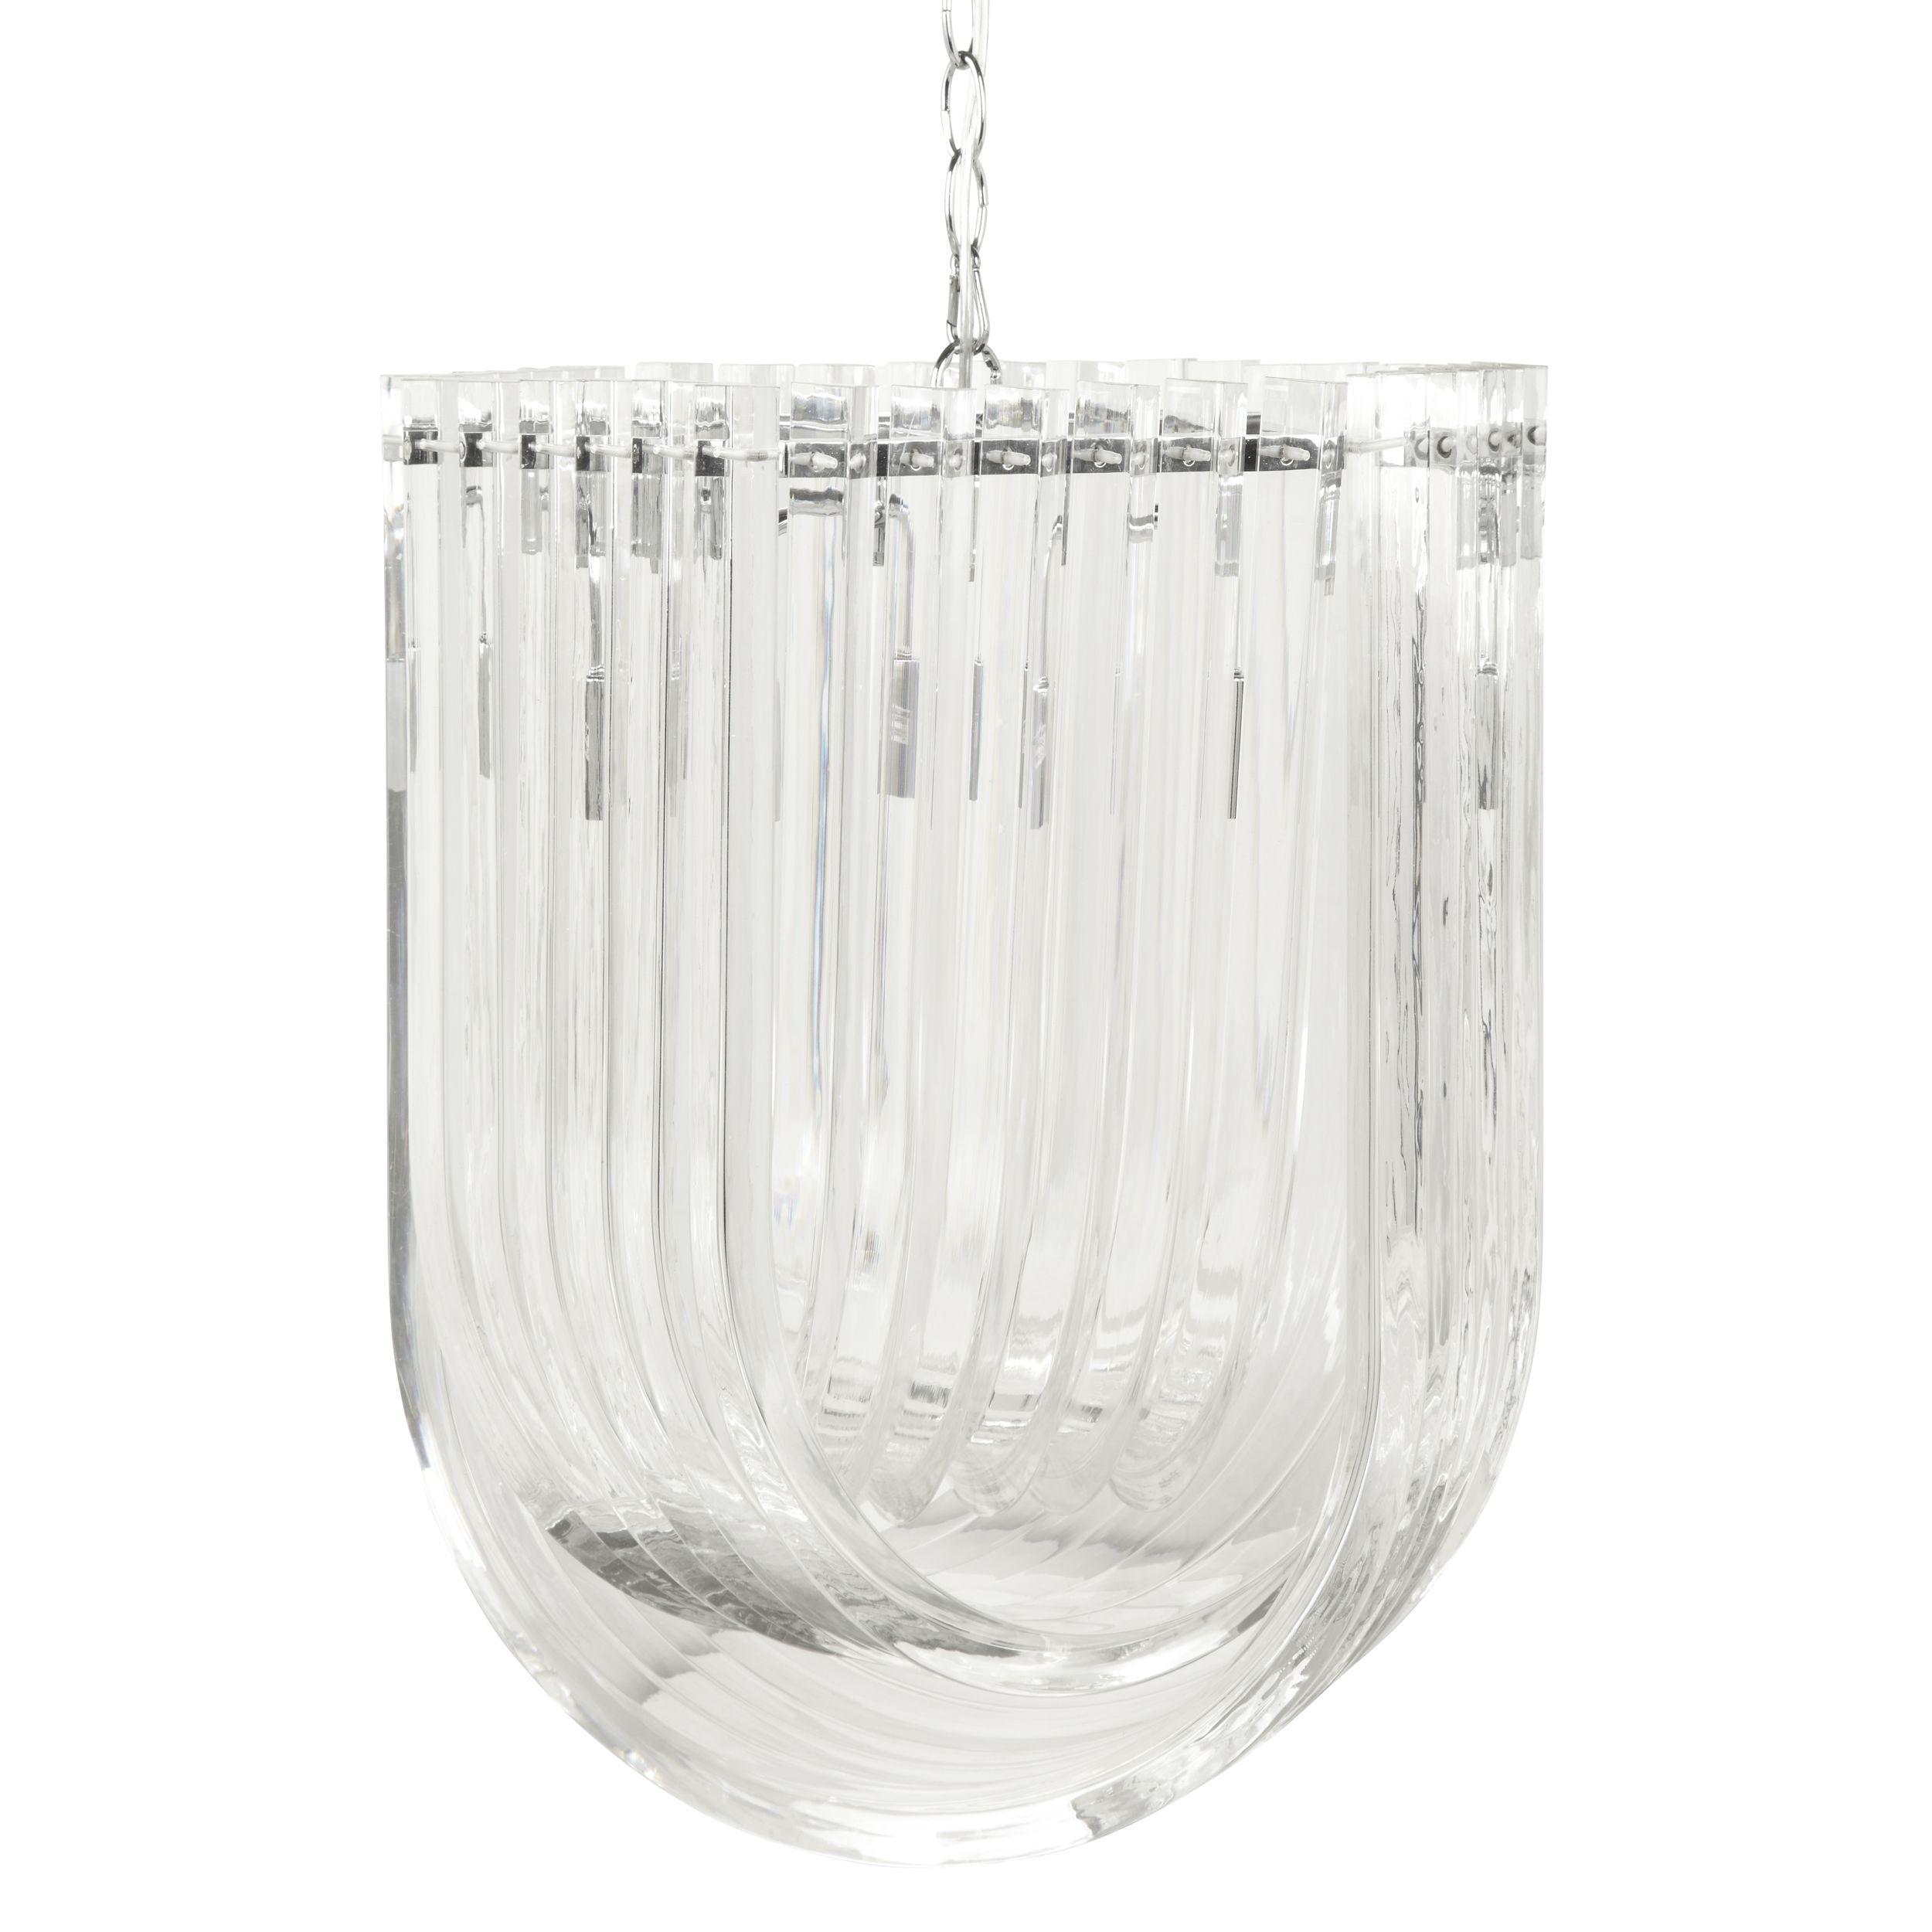 Athena chandelier lamps pinterest laura ashley chandeliers athena chandelier mozeypictures Choice Image